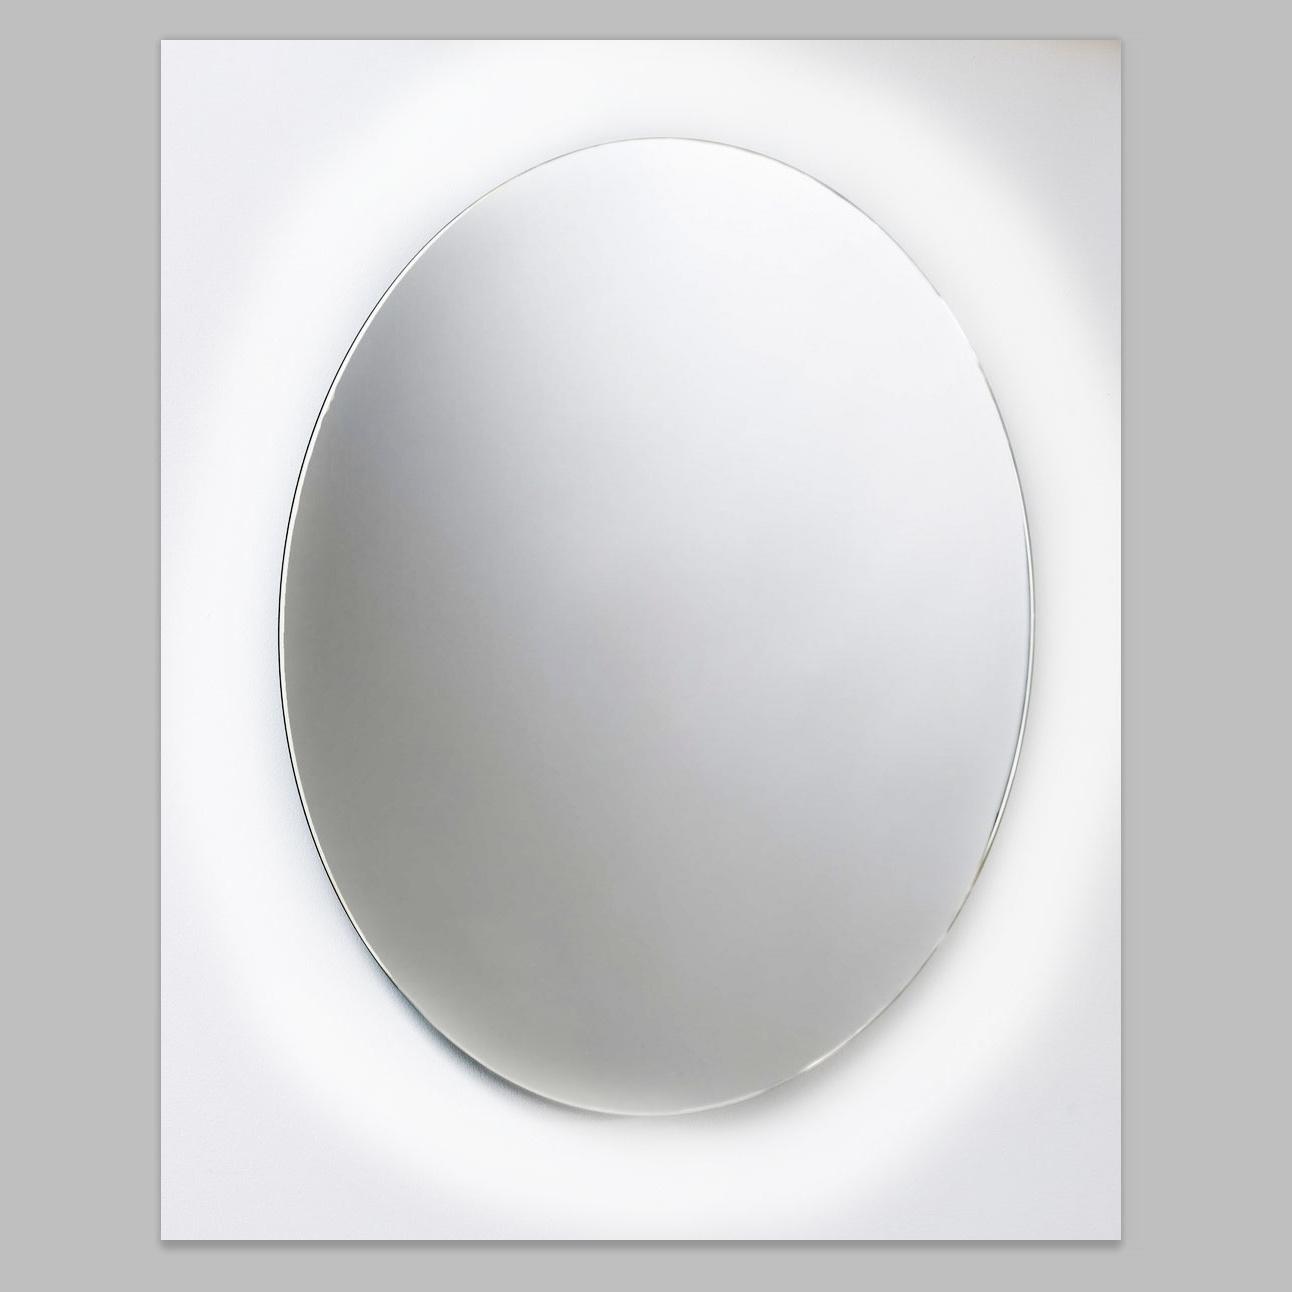 Ronde Wandspiegel Van Marcke Hula Met Indirecte LED Verlichting, Sensor En Anti-Damp 60x60 cm Glas V